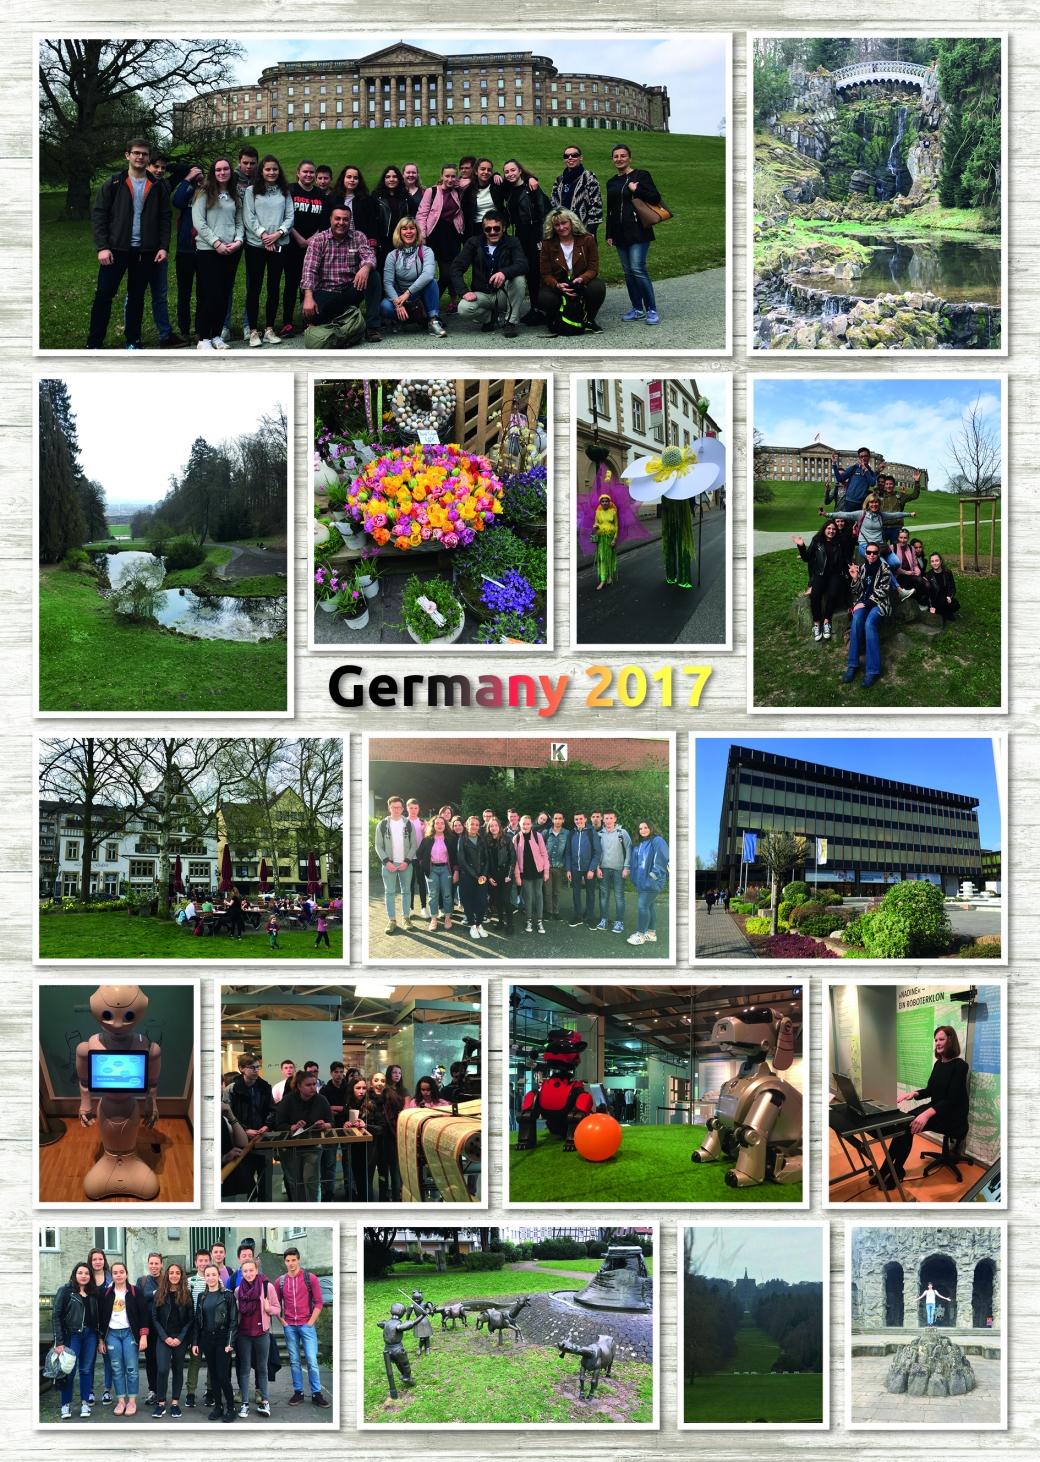 Germany-2017-2